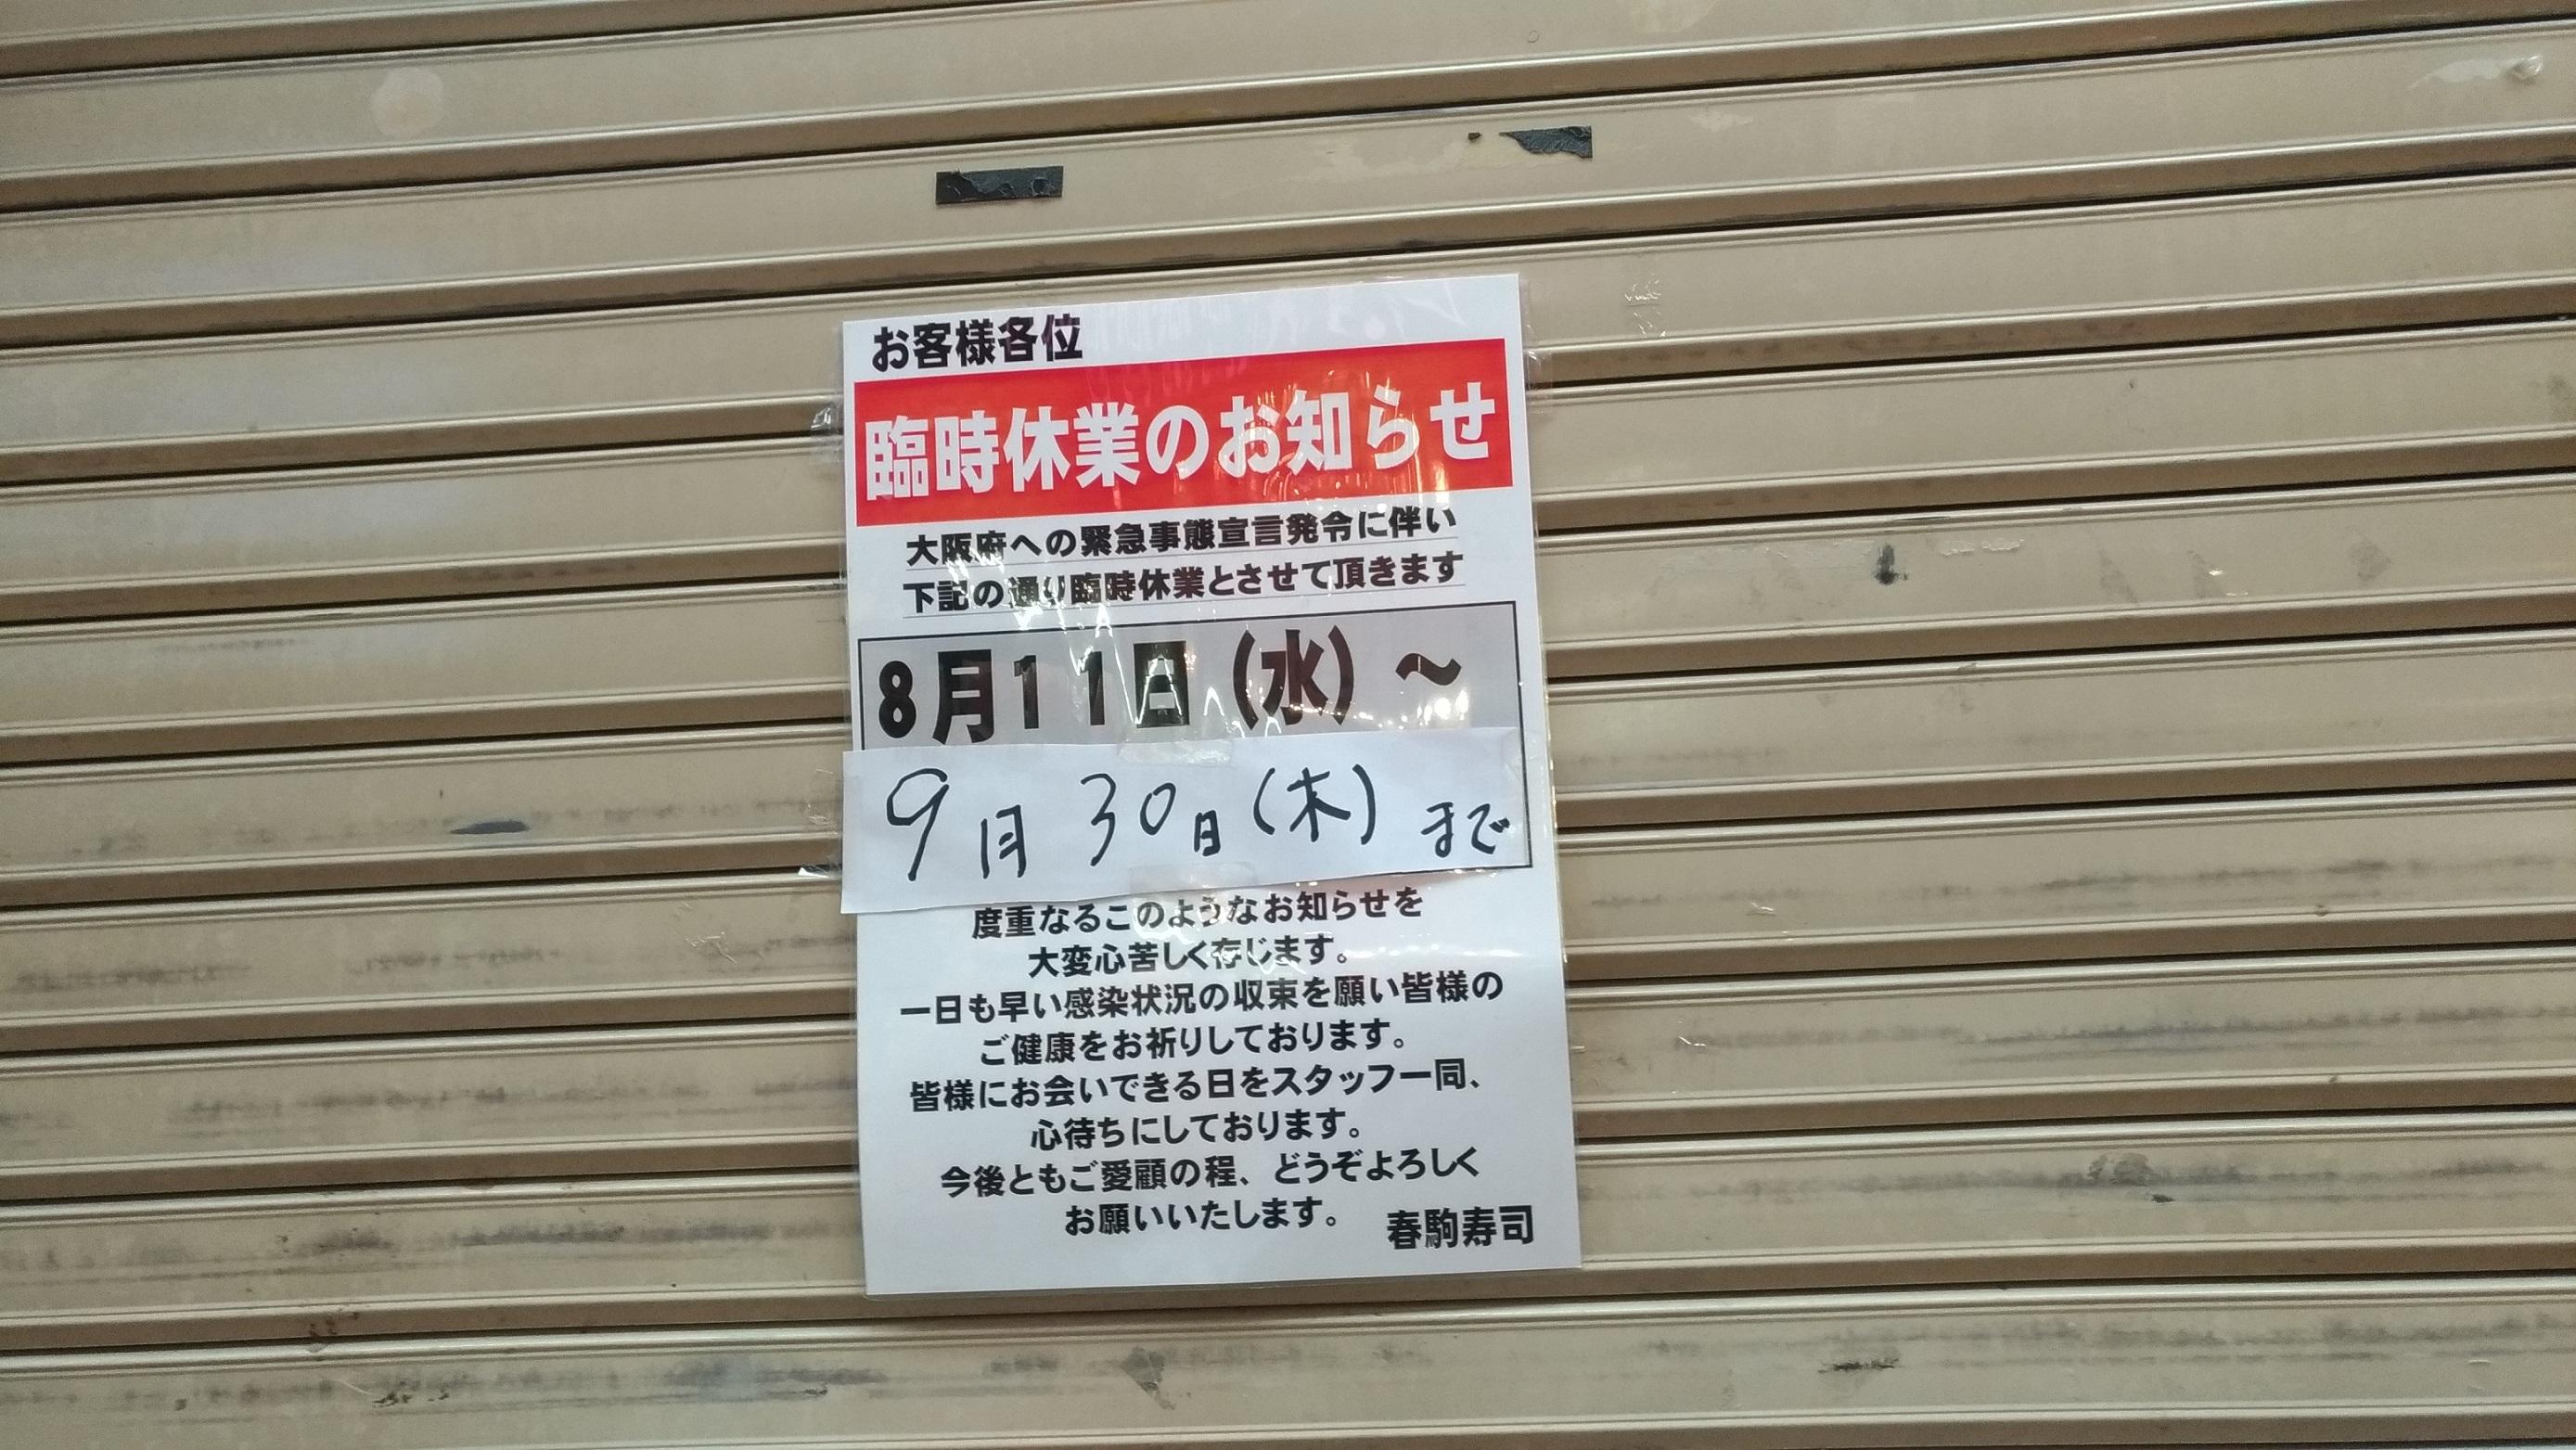 harukoma_sushi_0925_2021.jpg